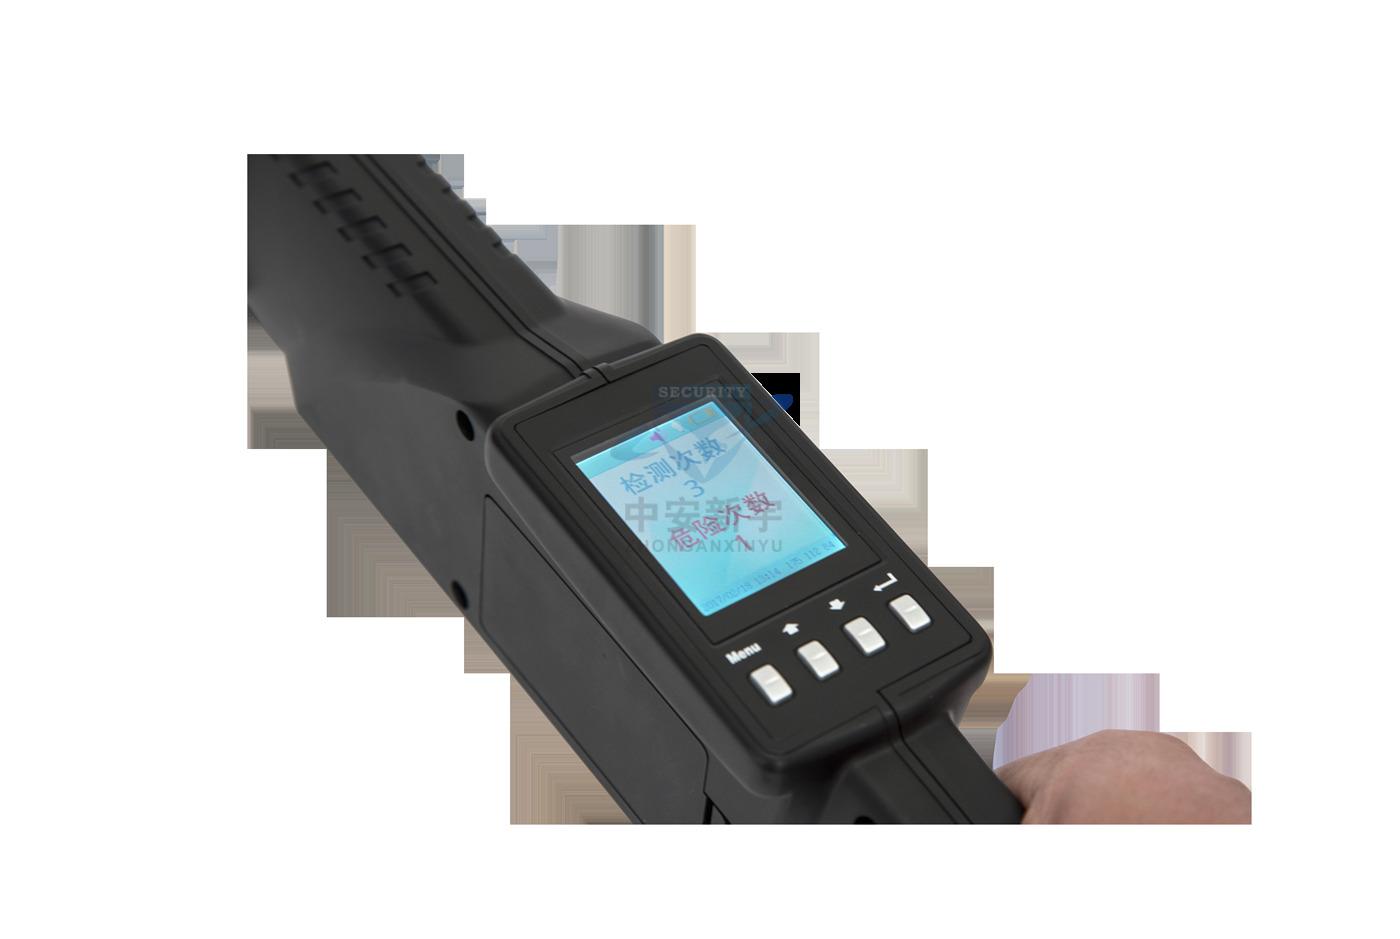 YJ-SC02-ZX手持式危险液体安全检测仪